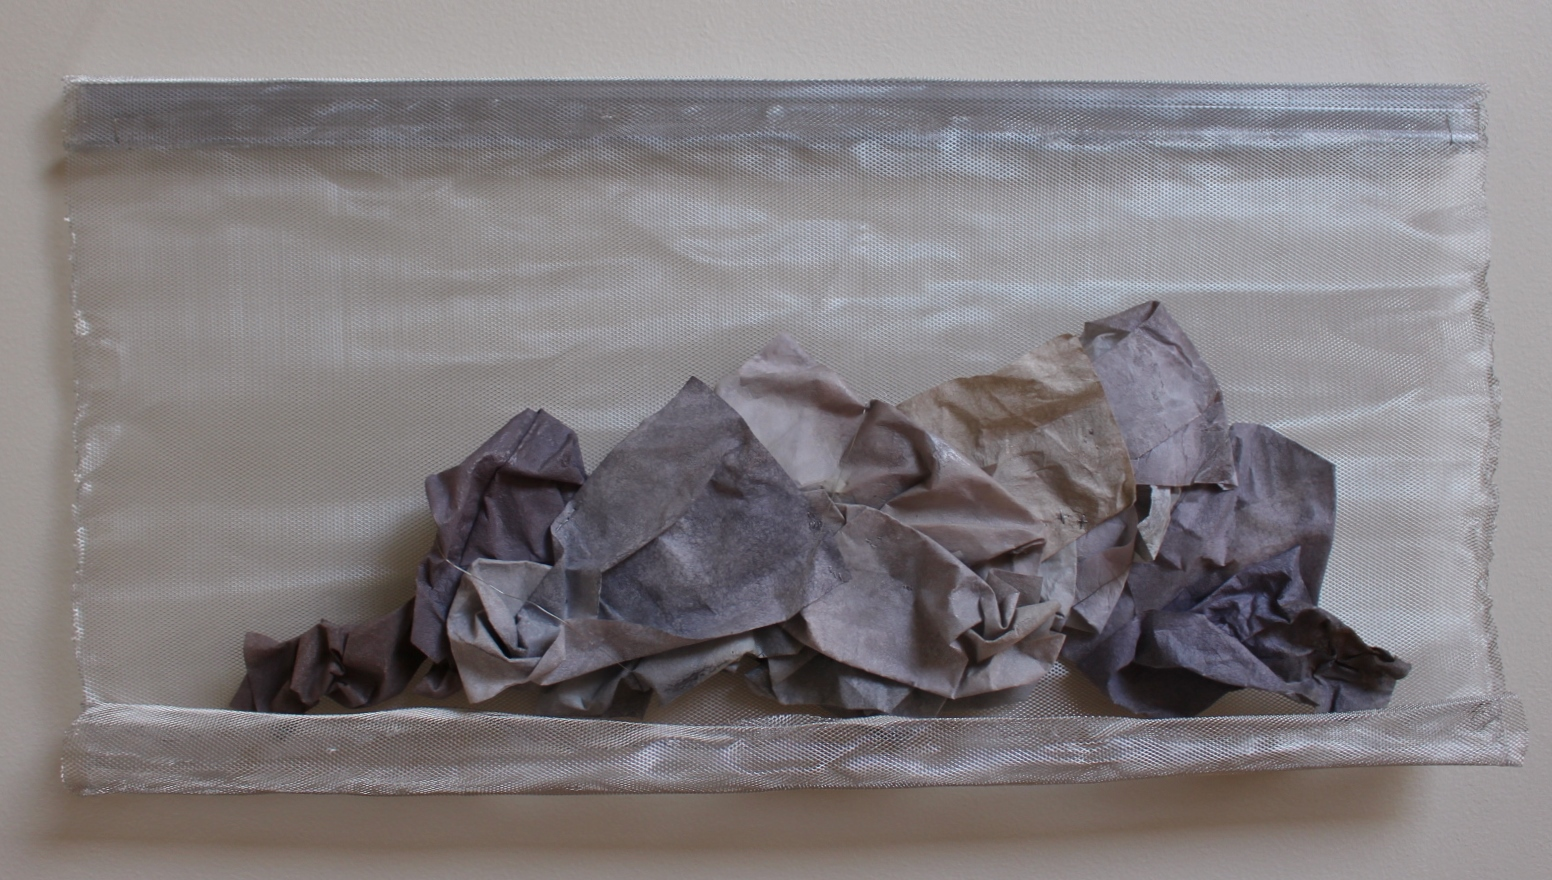 Evidence of Red, Helen McLoughlin, element15